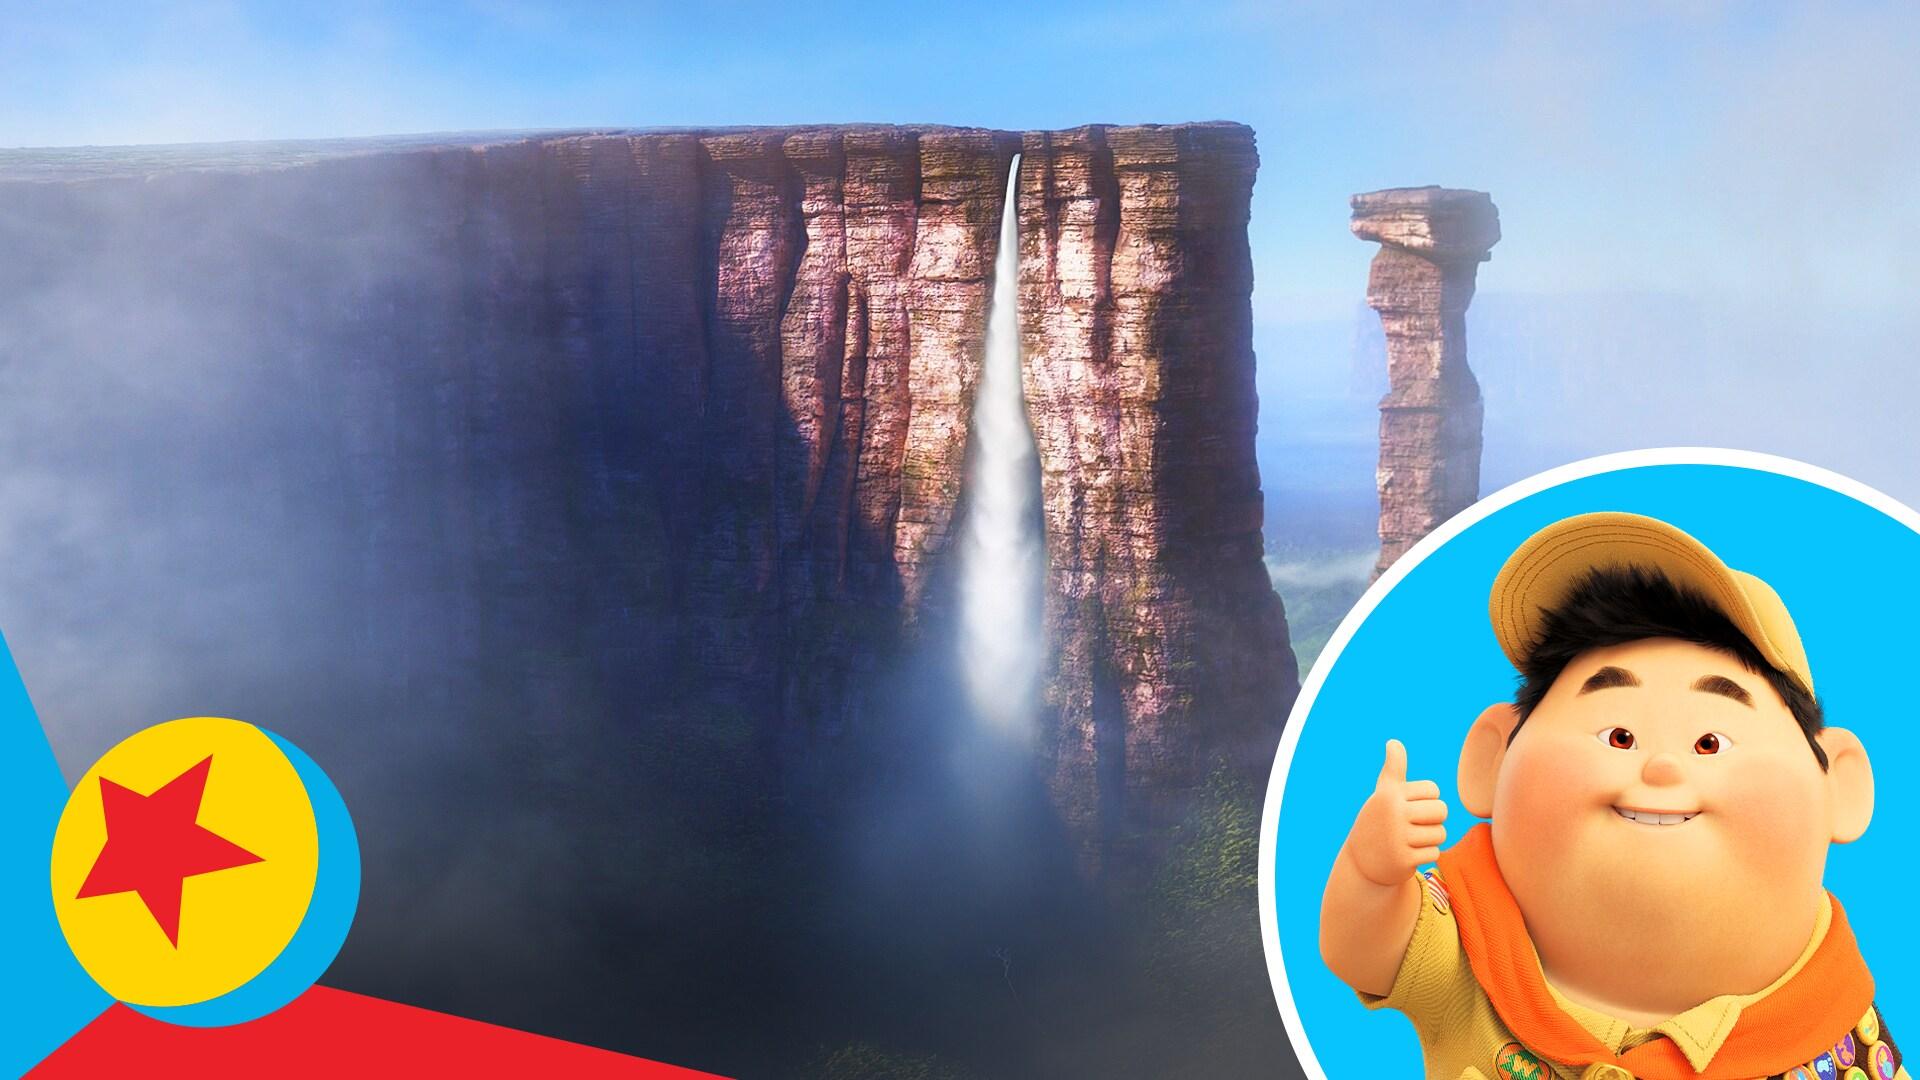 Pixar Did You Know: Locations | Pixar